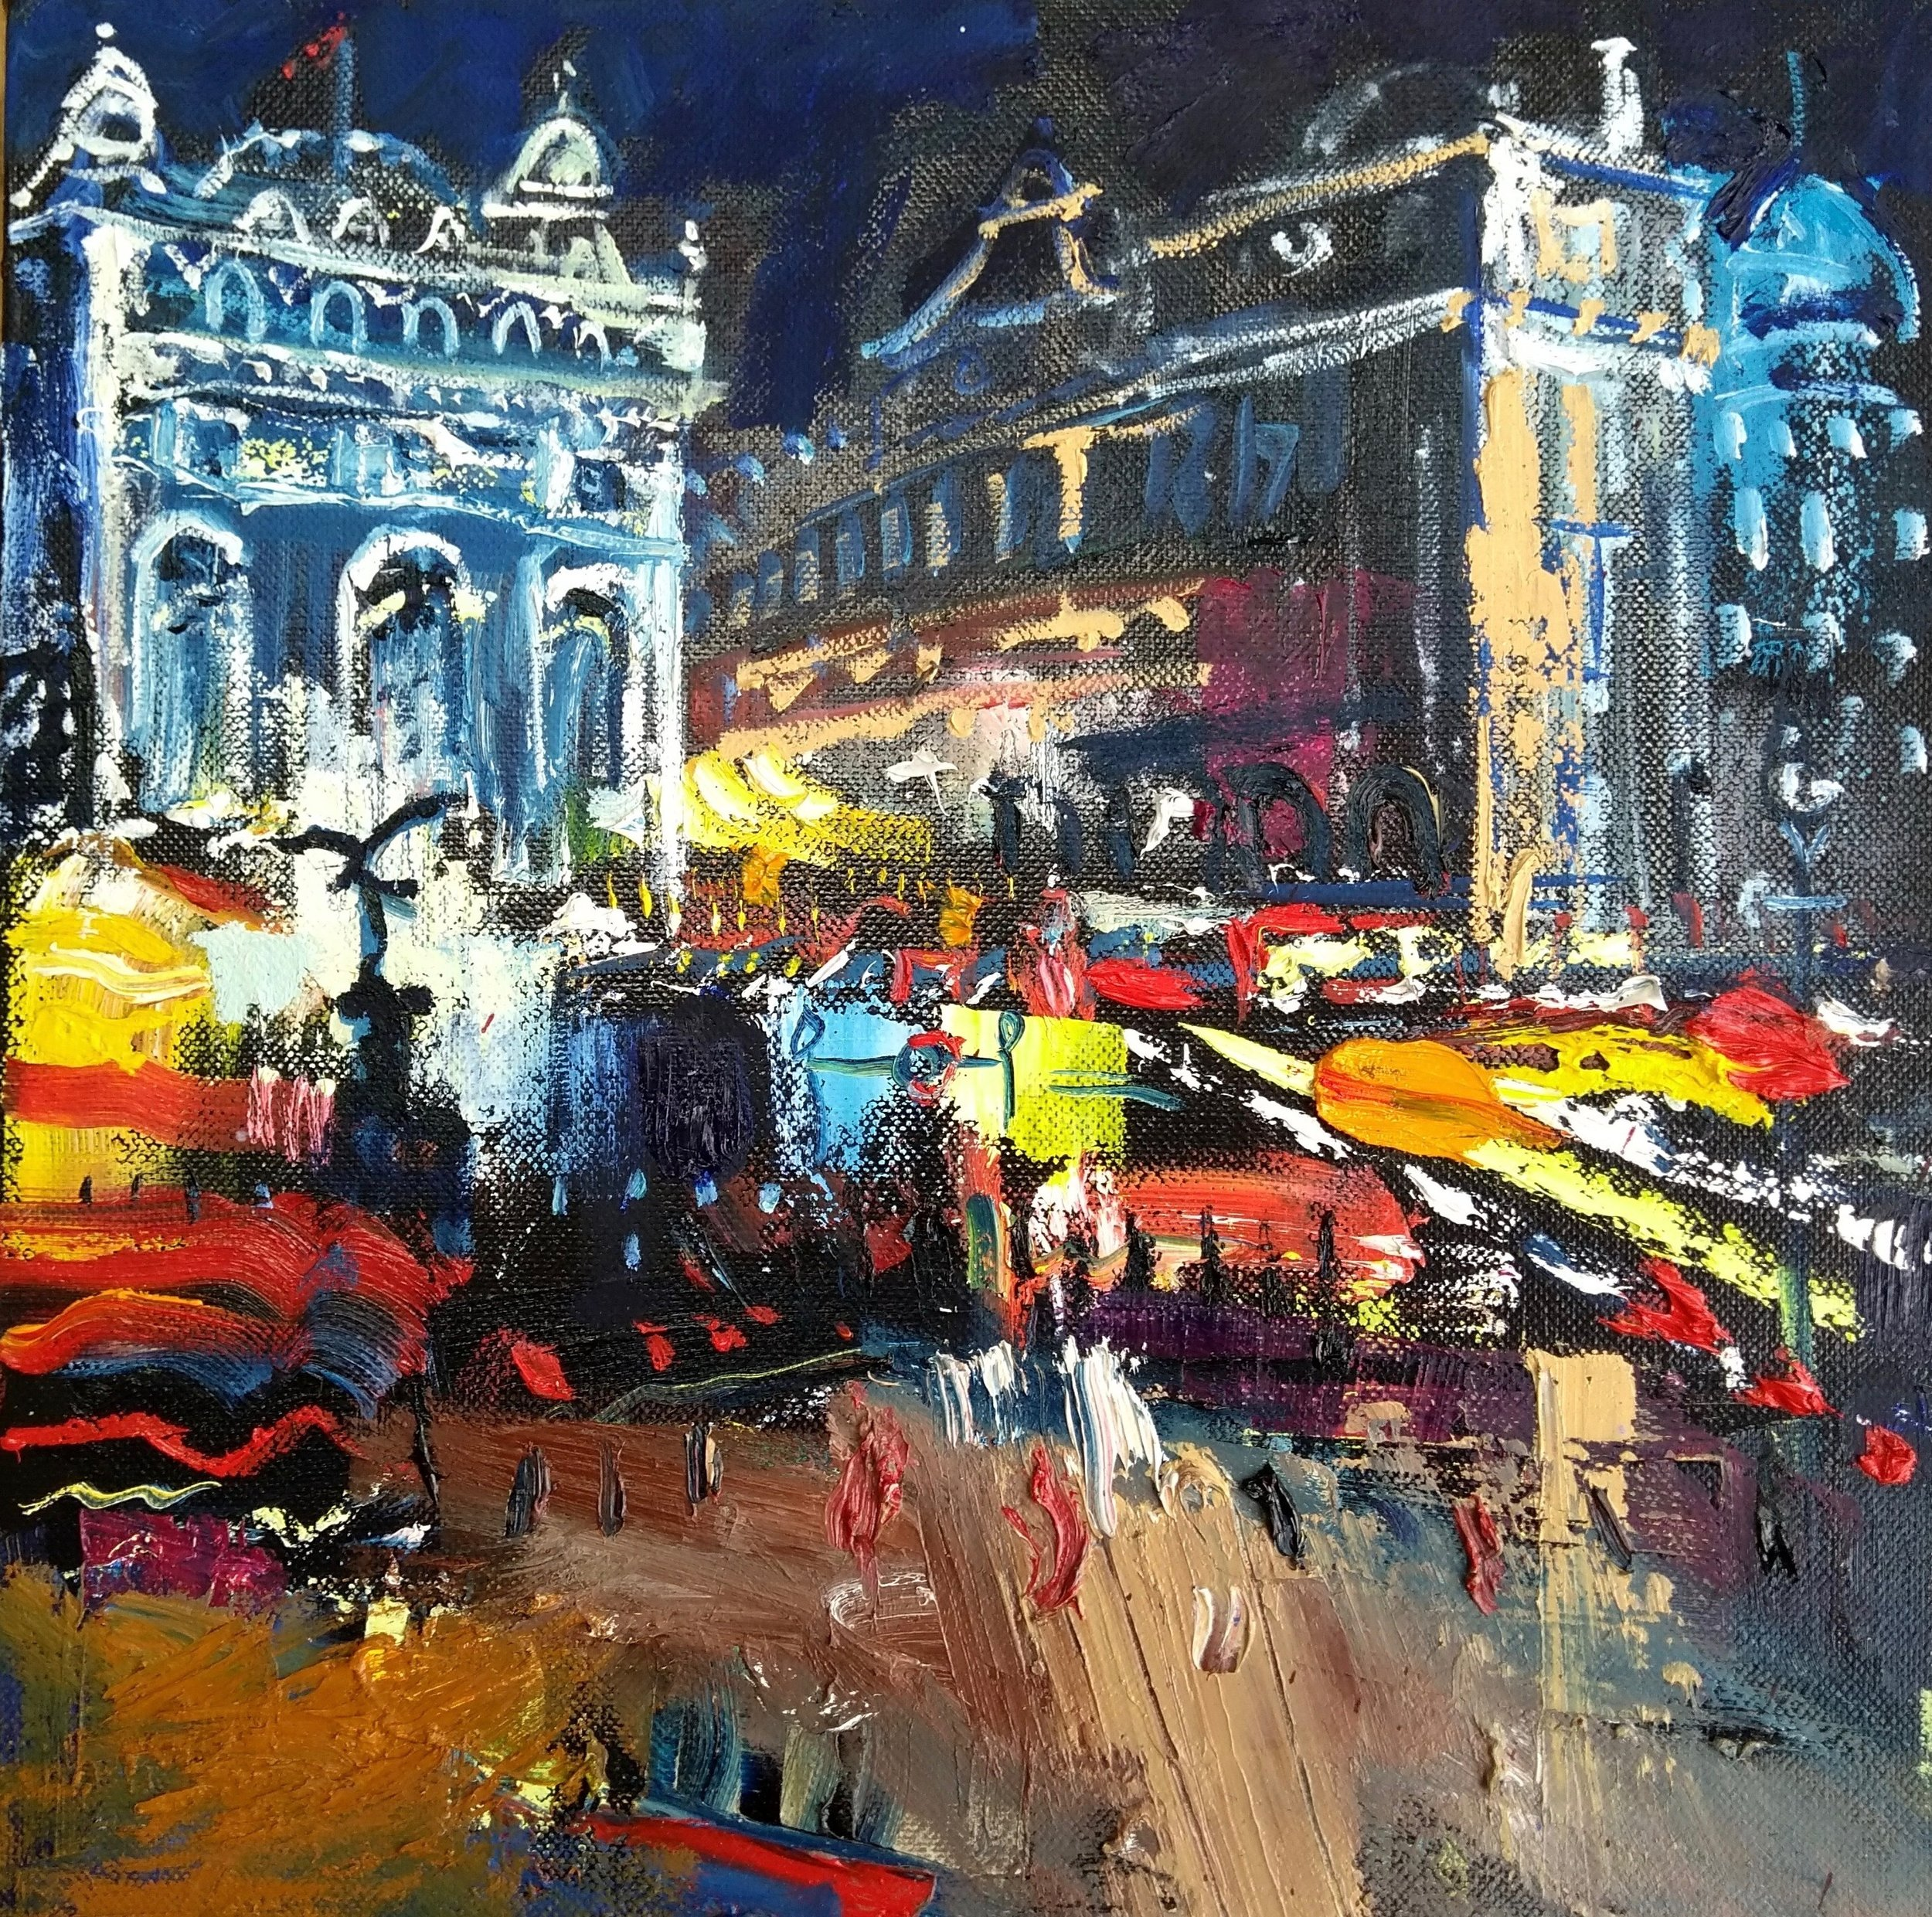 Piccadilly Circus at Night - Richard Barnes